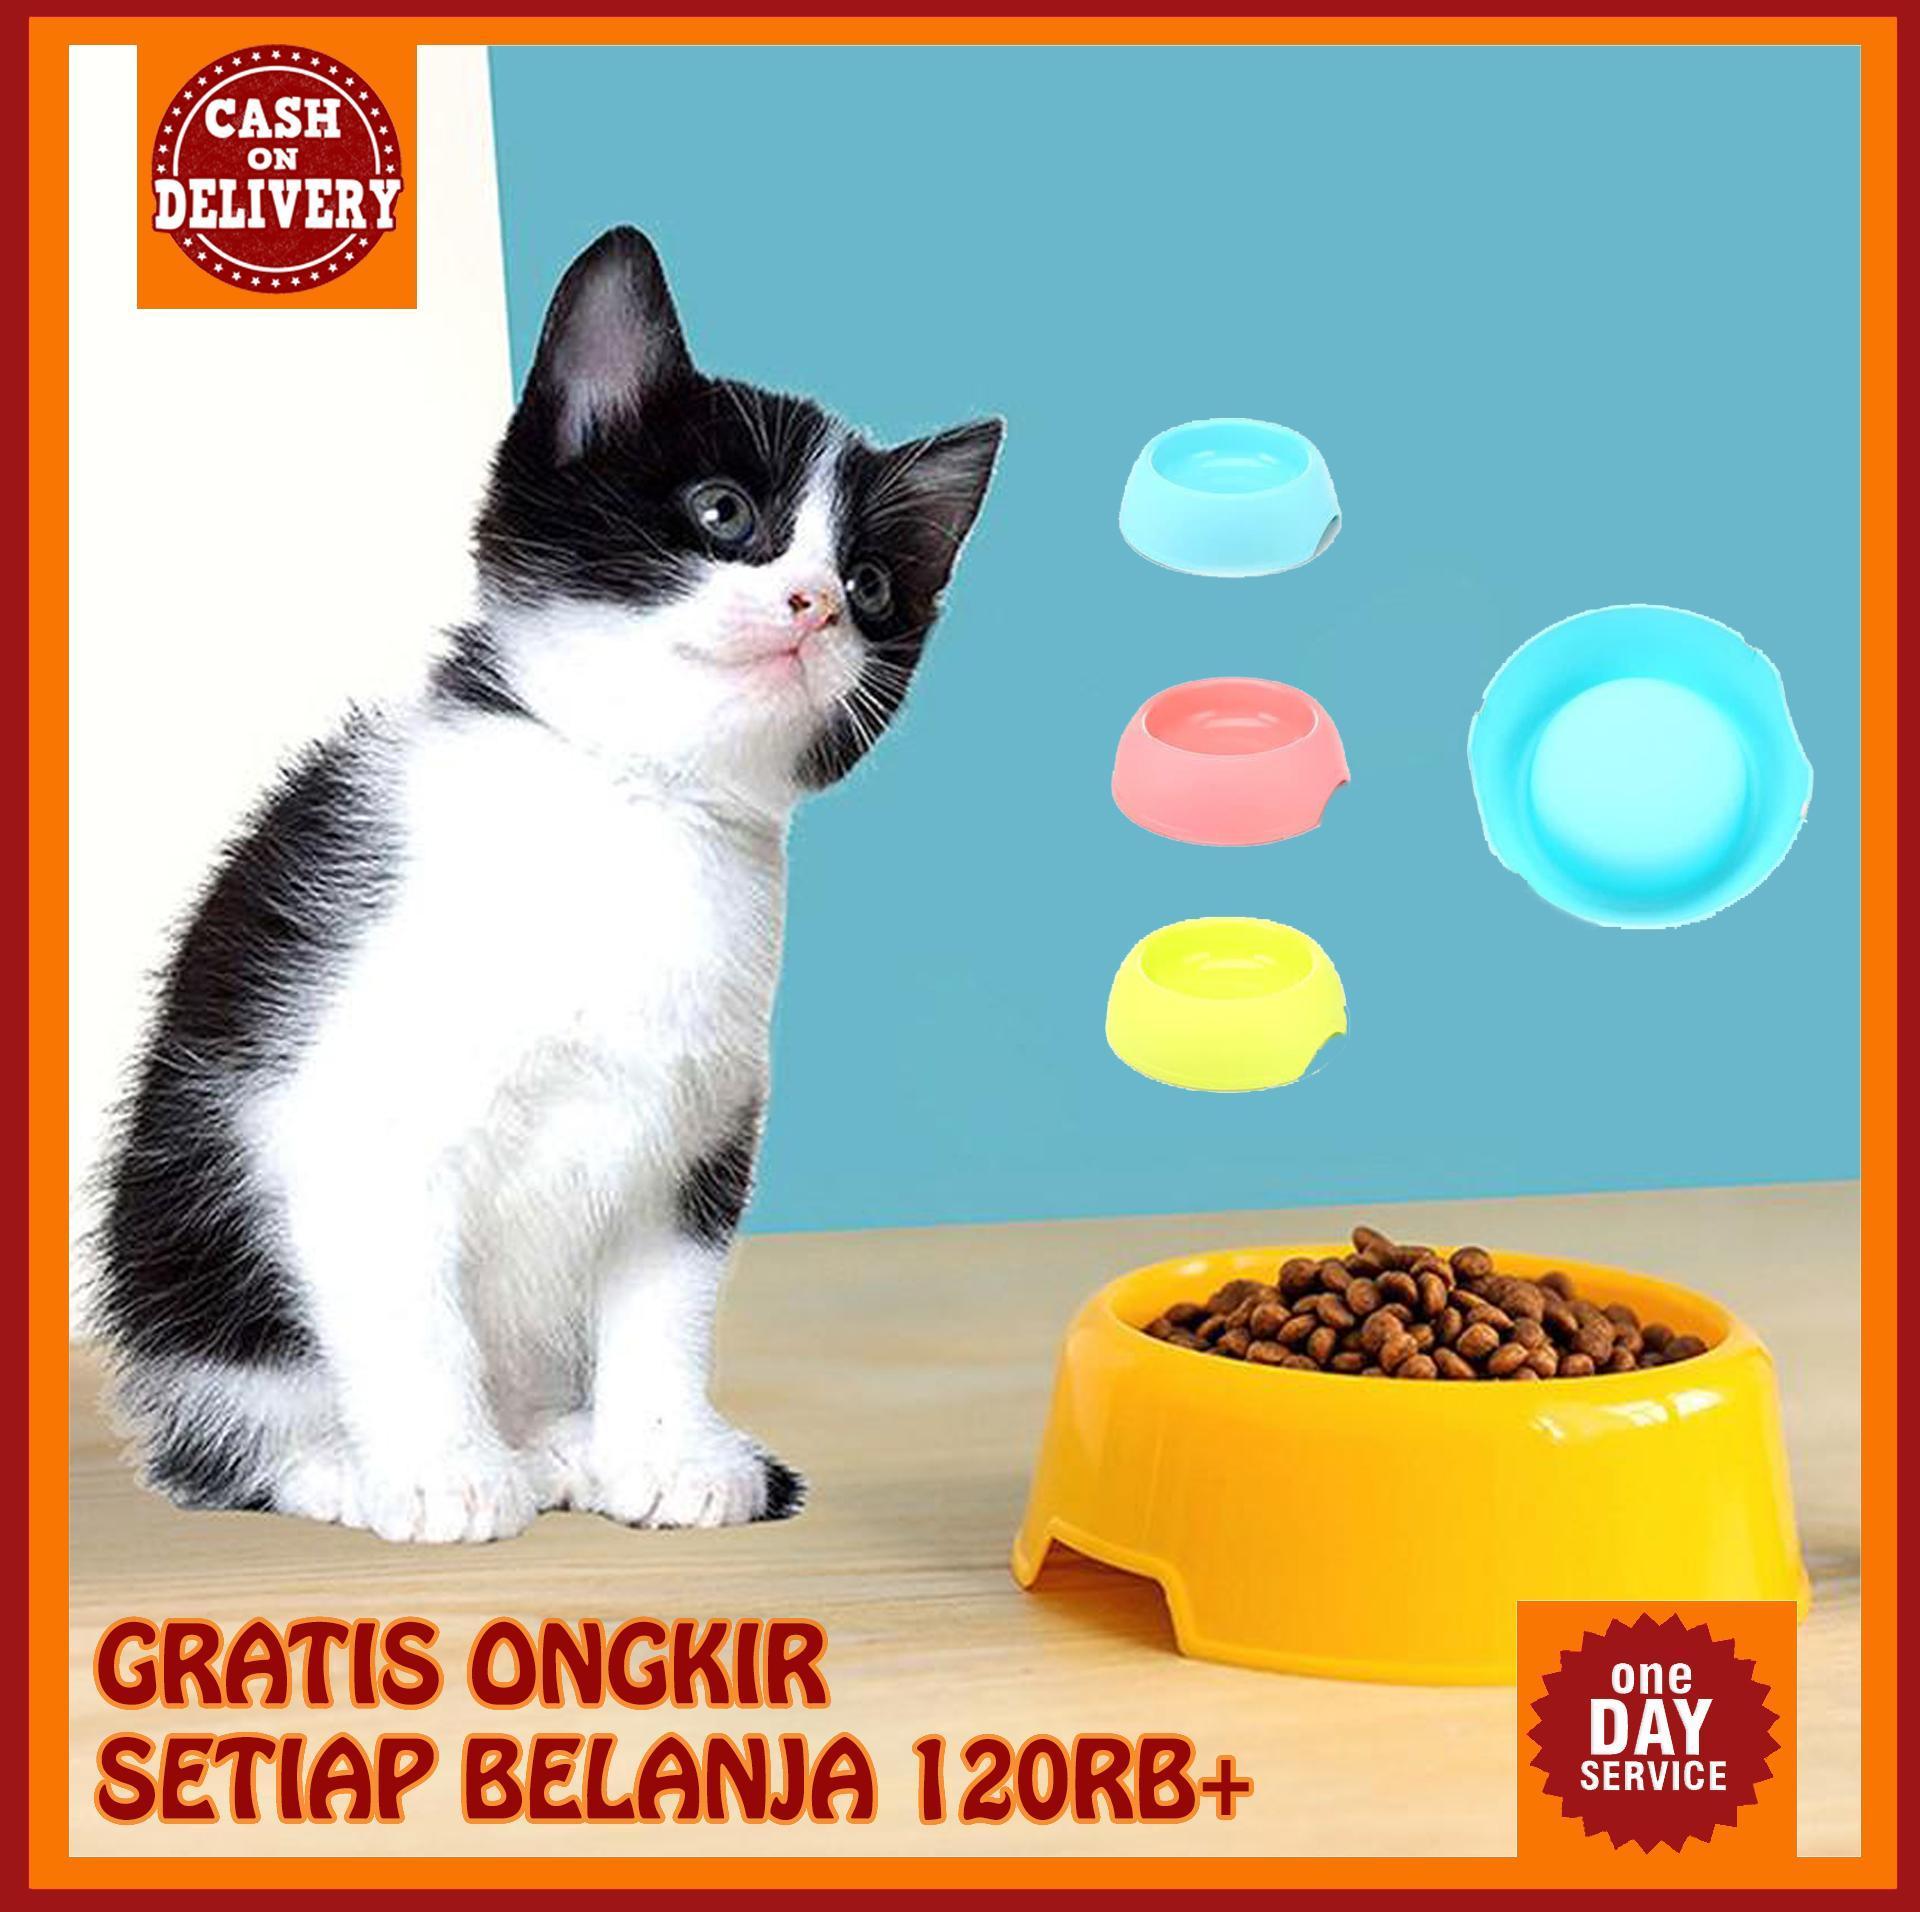 Gambar Kucing Makan godean.web.id